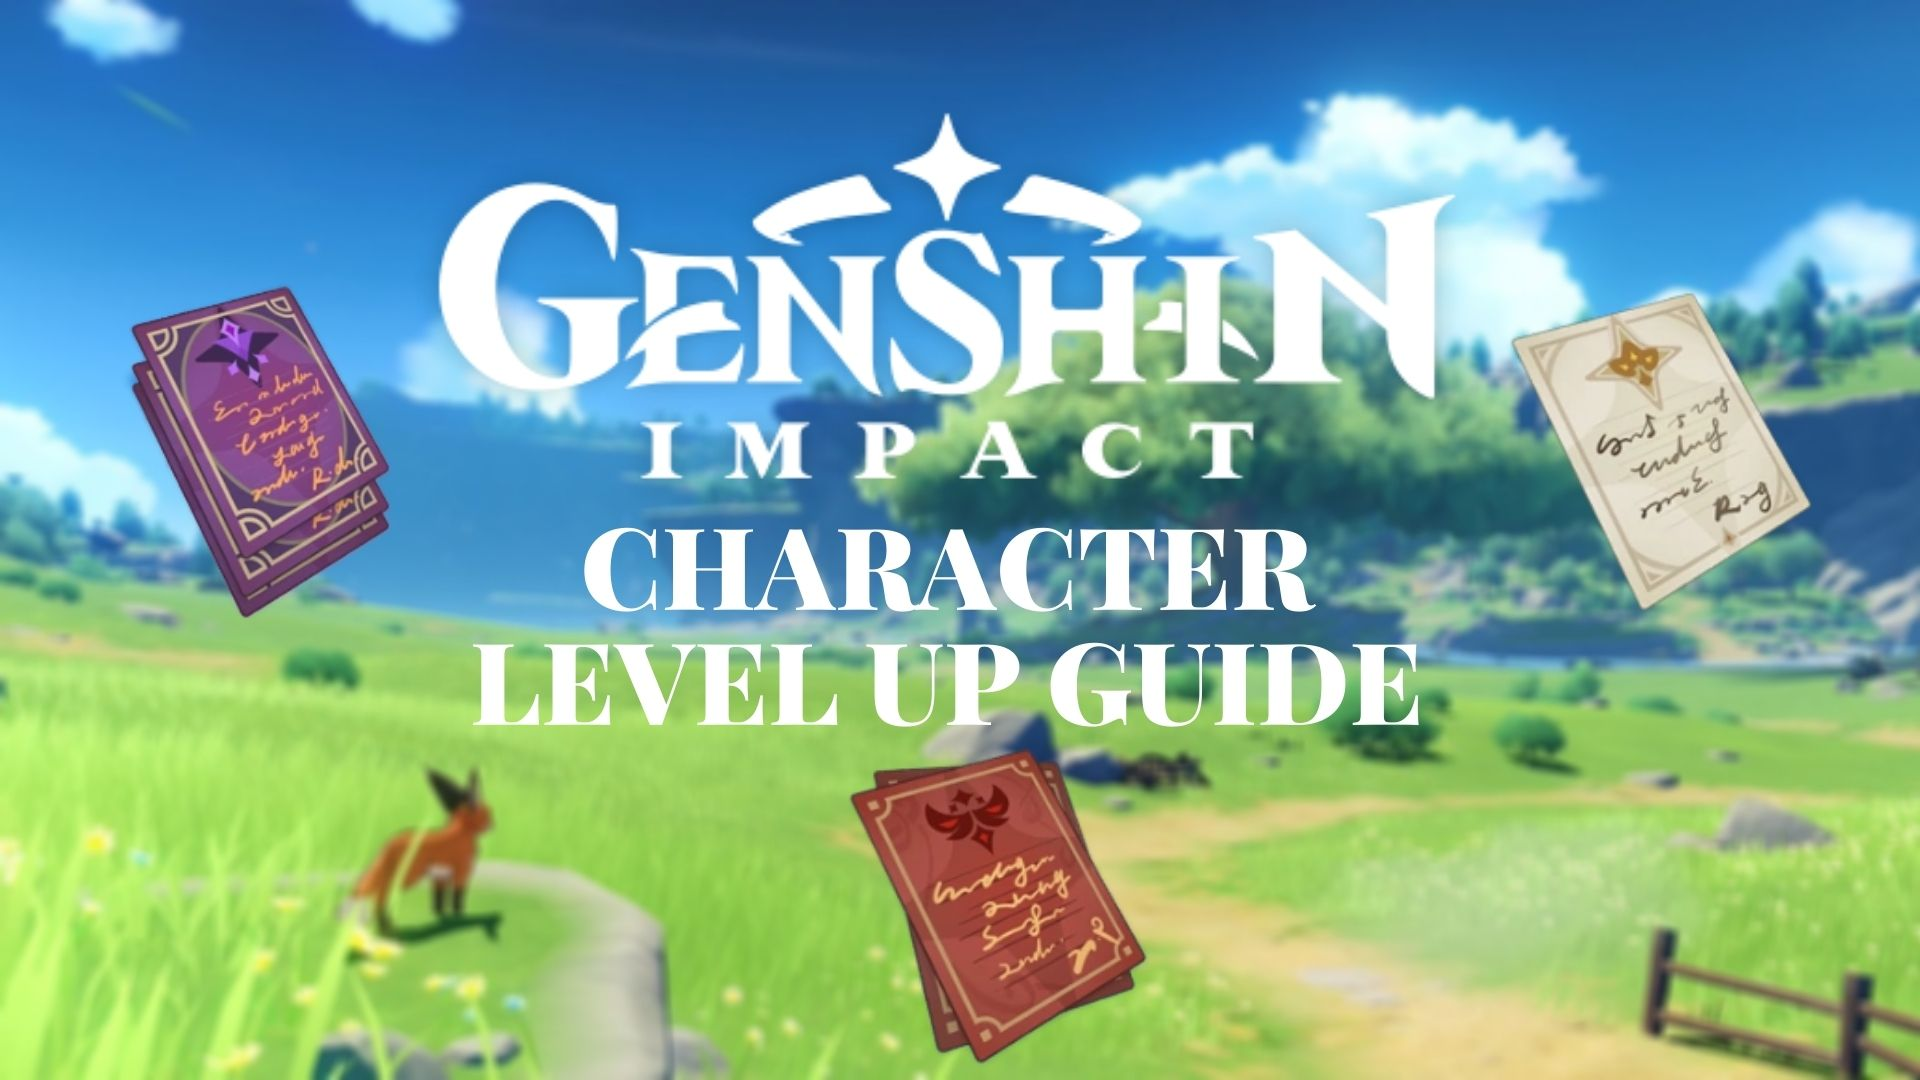 Genshin Impact character level up